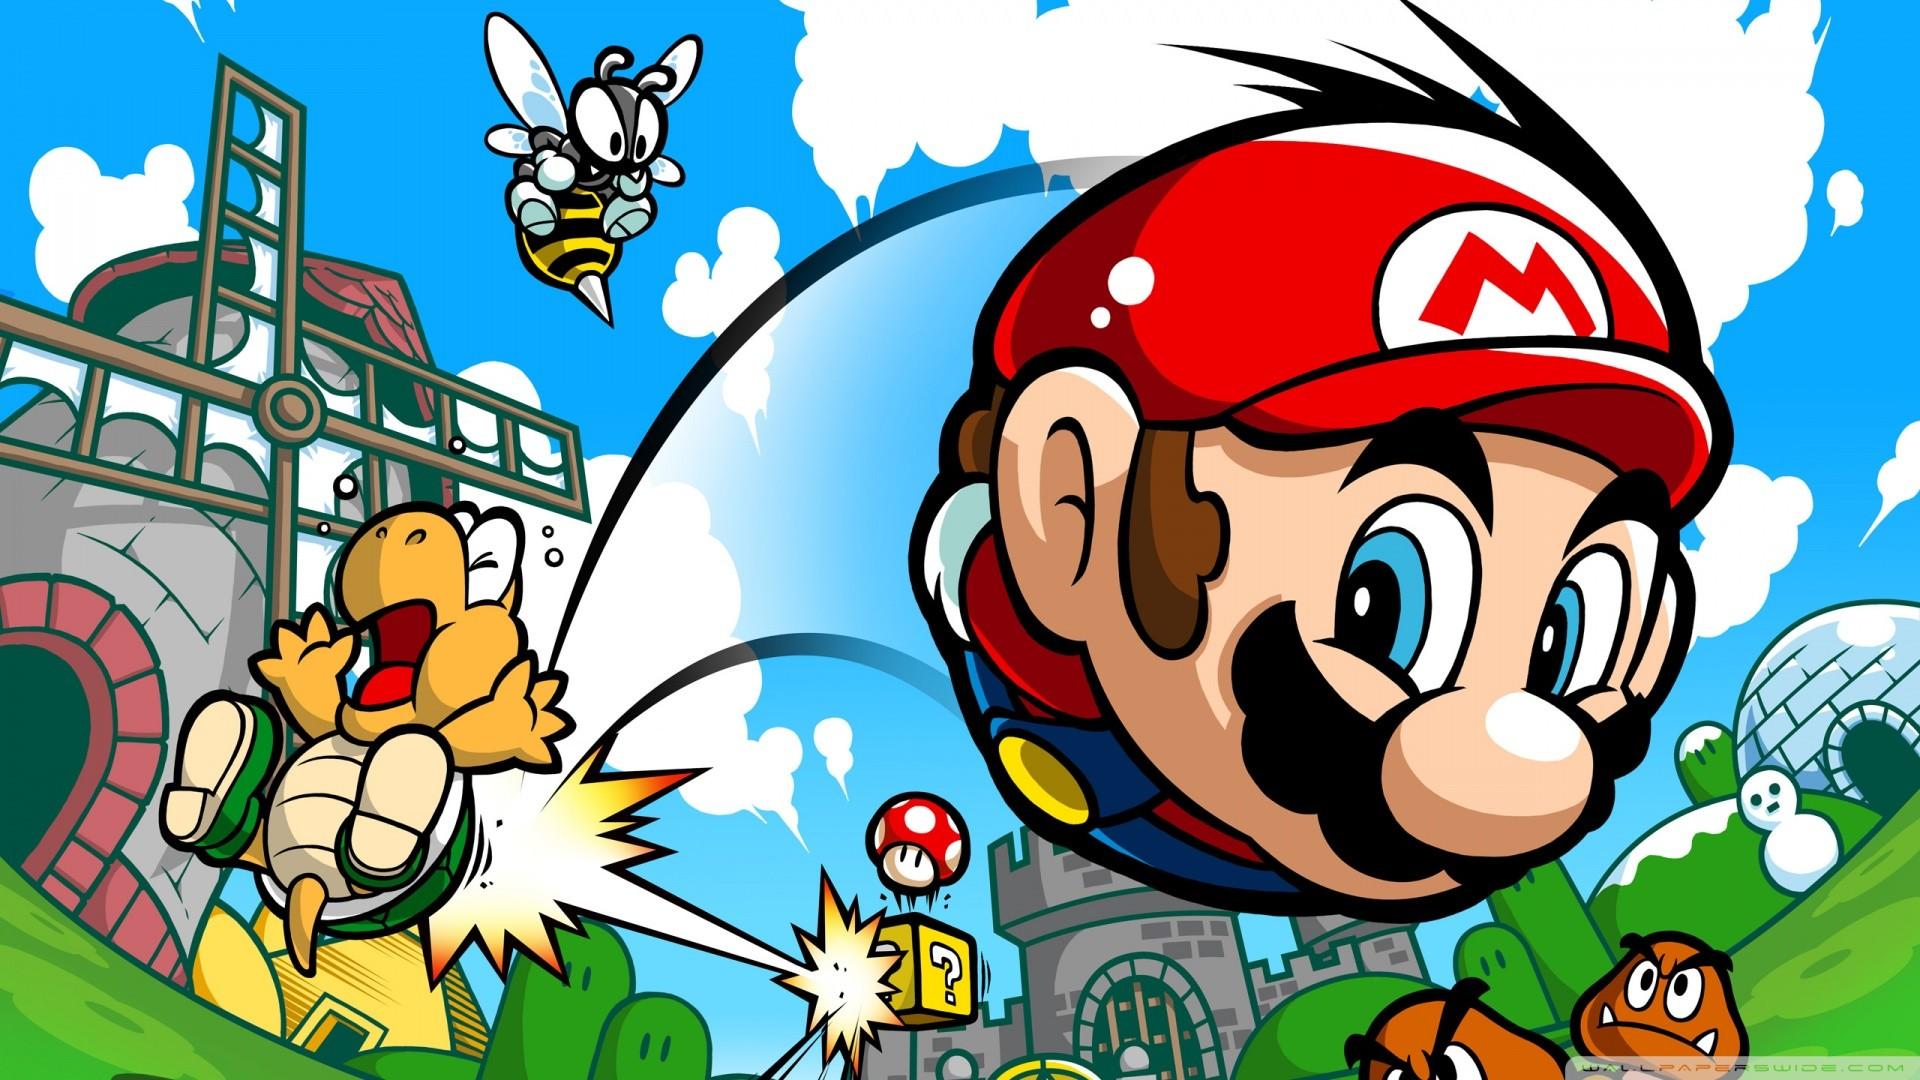 Mario Wallpaper HD (79+ images)